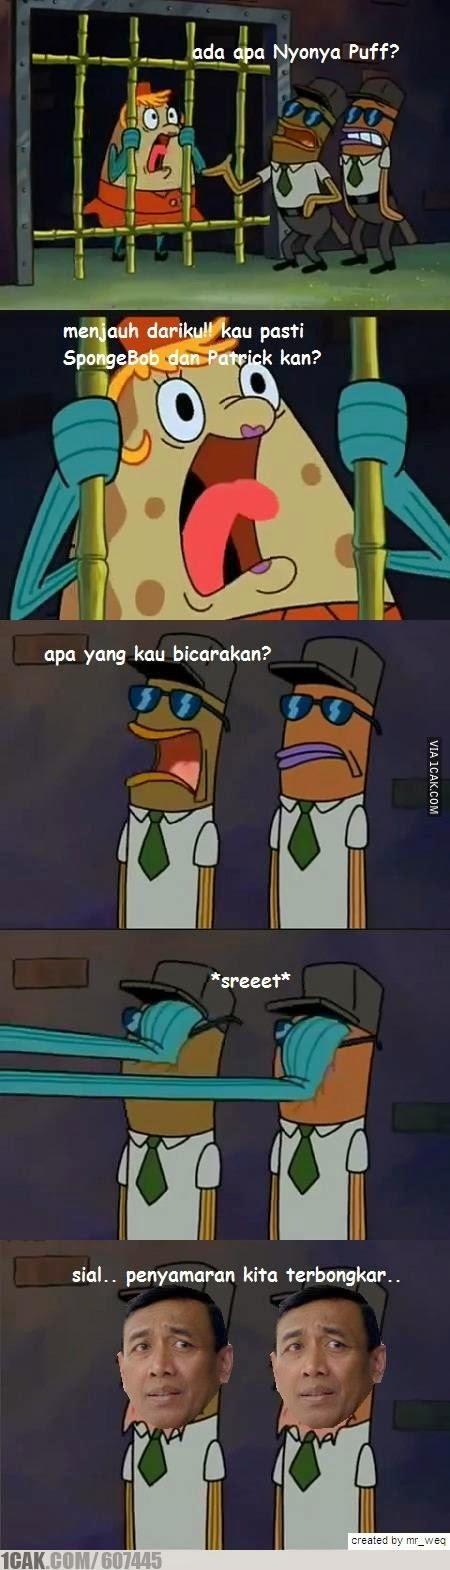 Meme Lucu Wiranto Menyamar 11